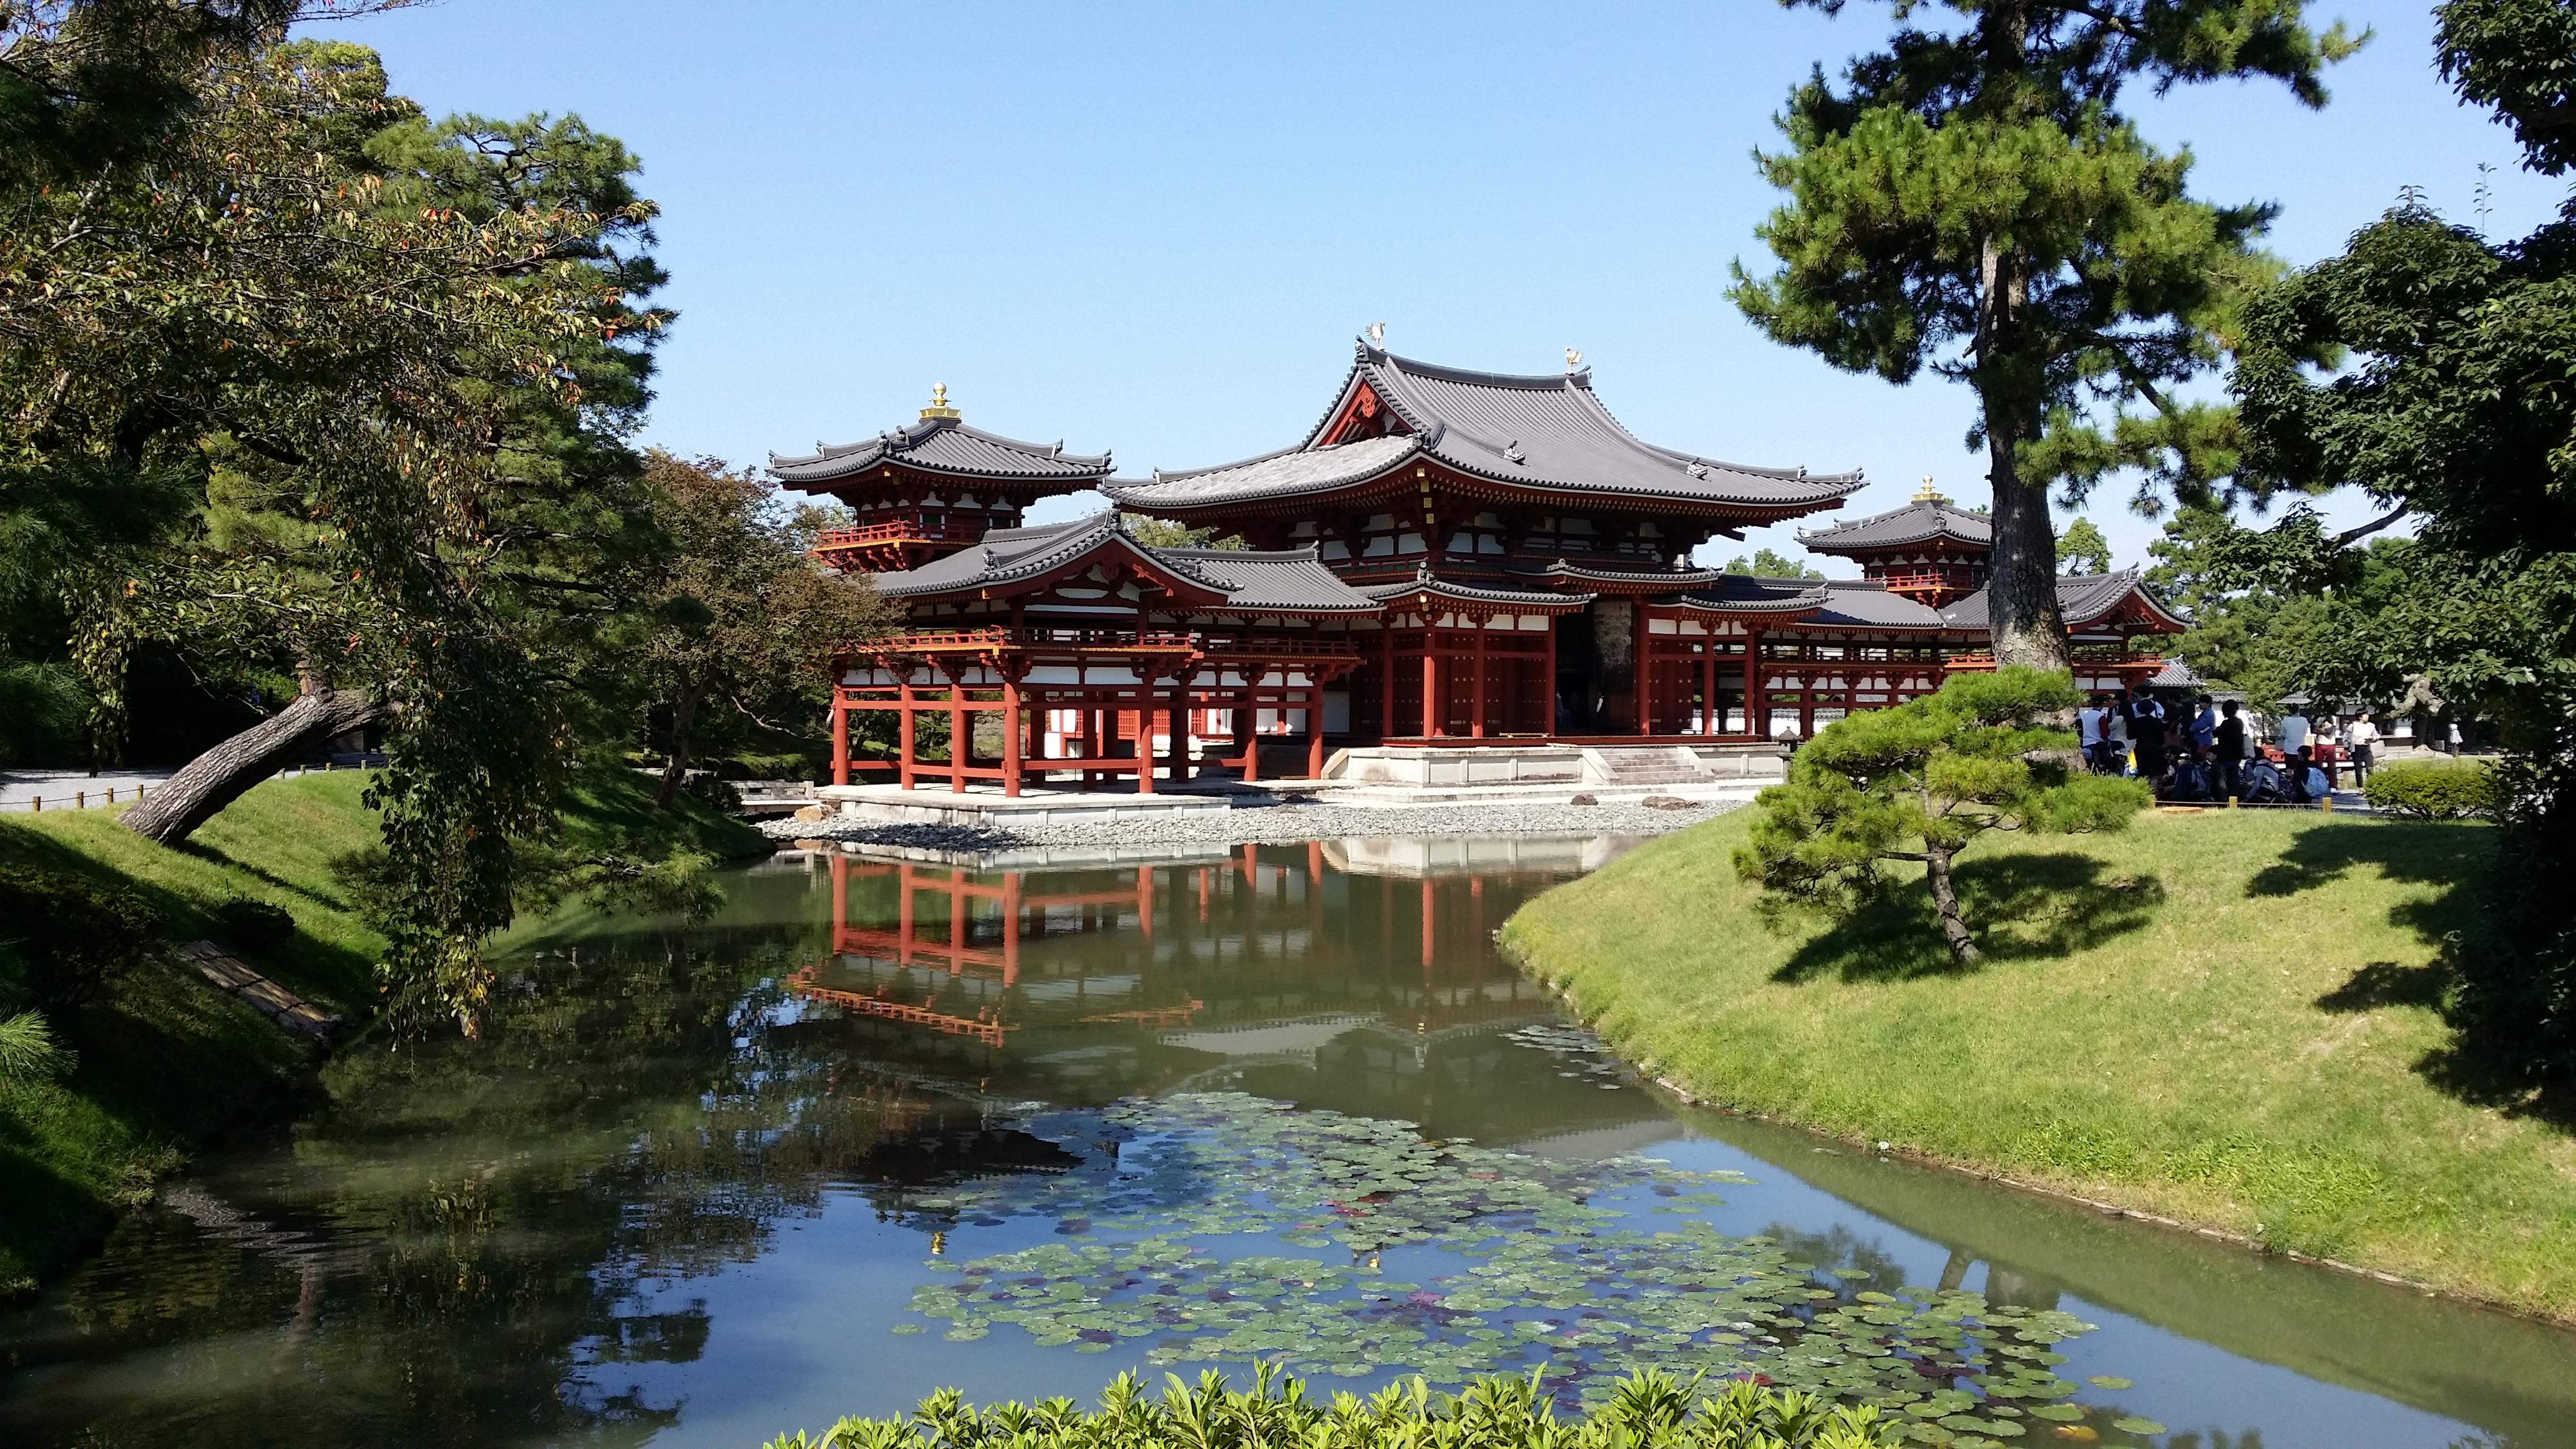 http://www.vantech.jp/shops/kyoto/20141008_101359.jpg